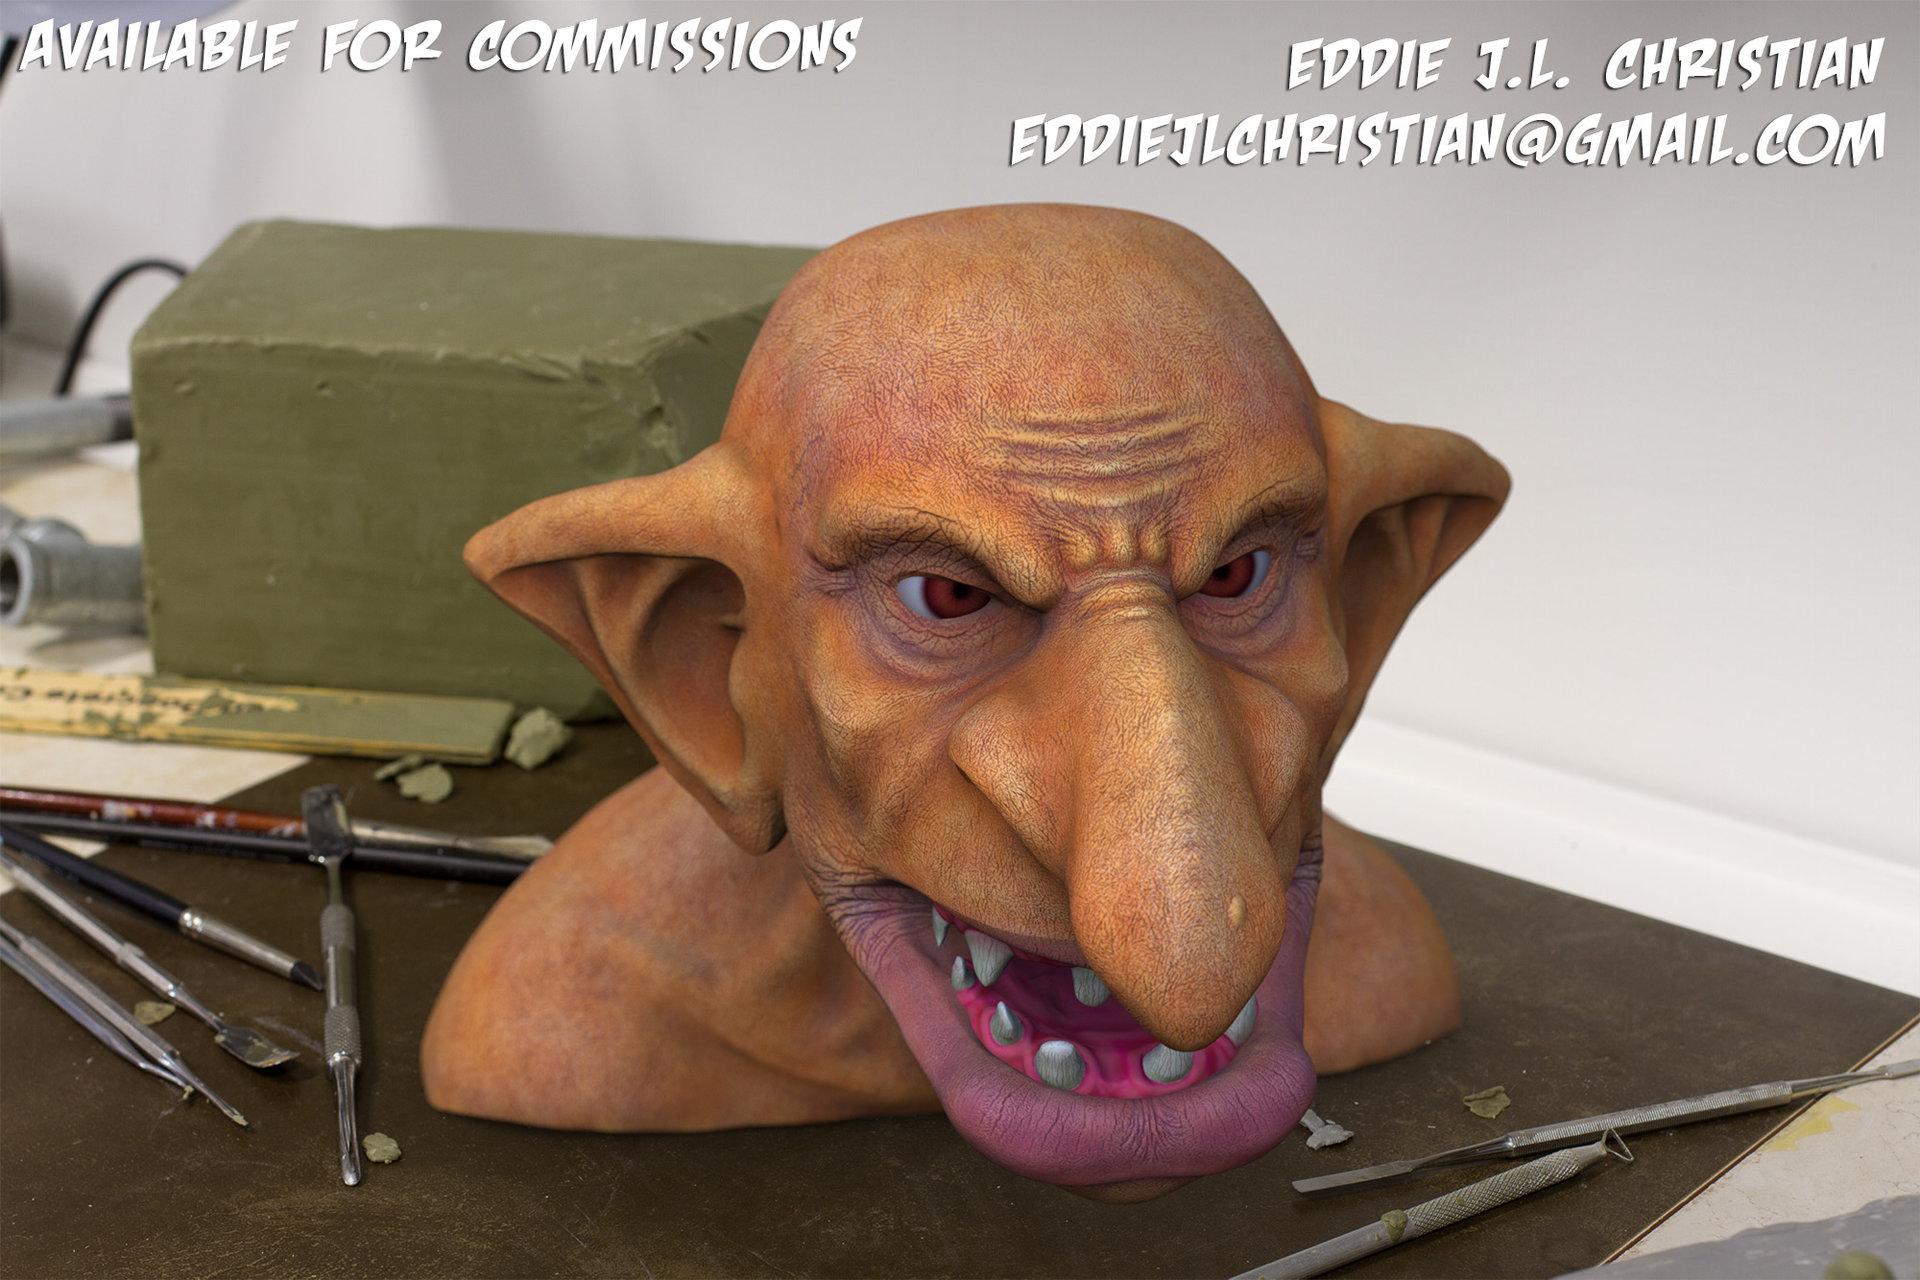 Eddie christian orc promo